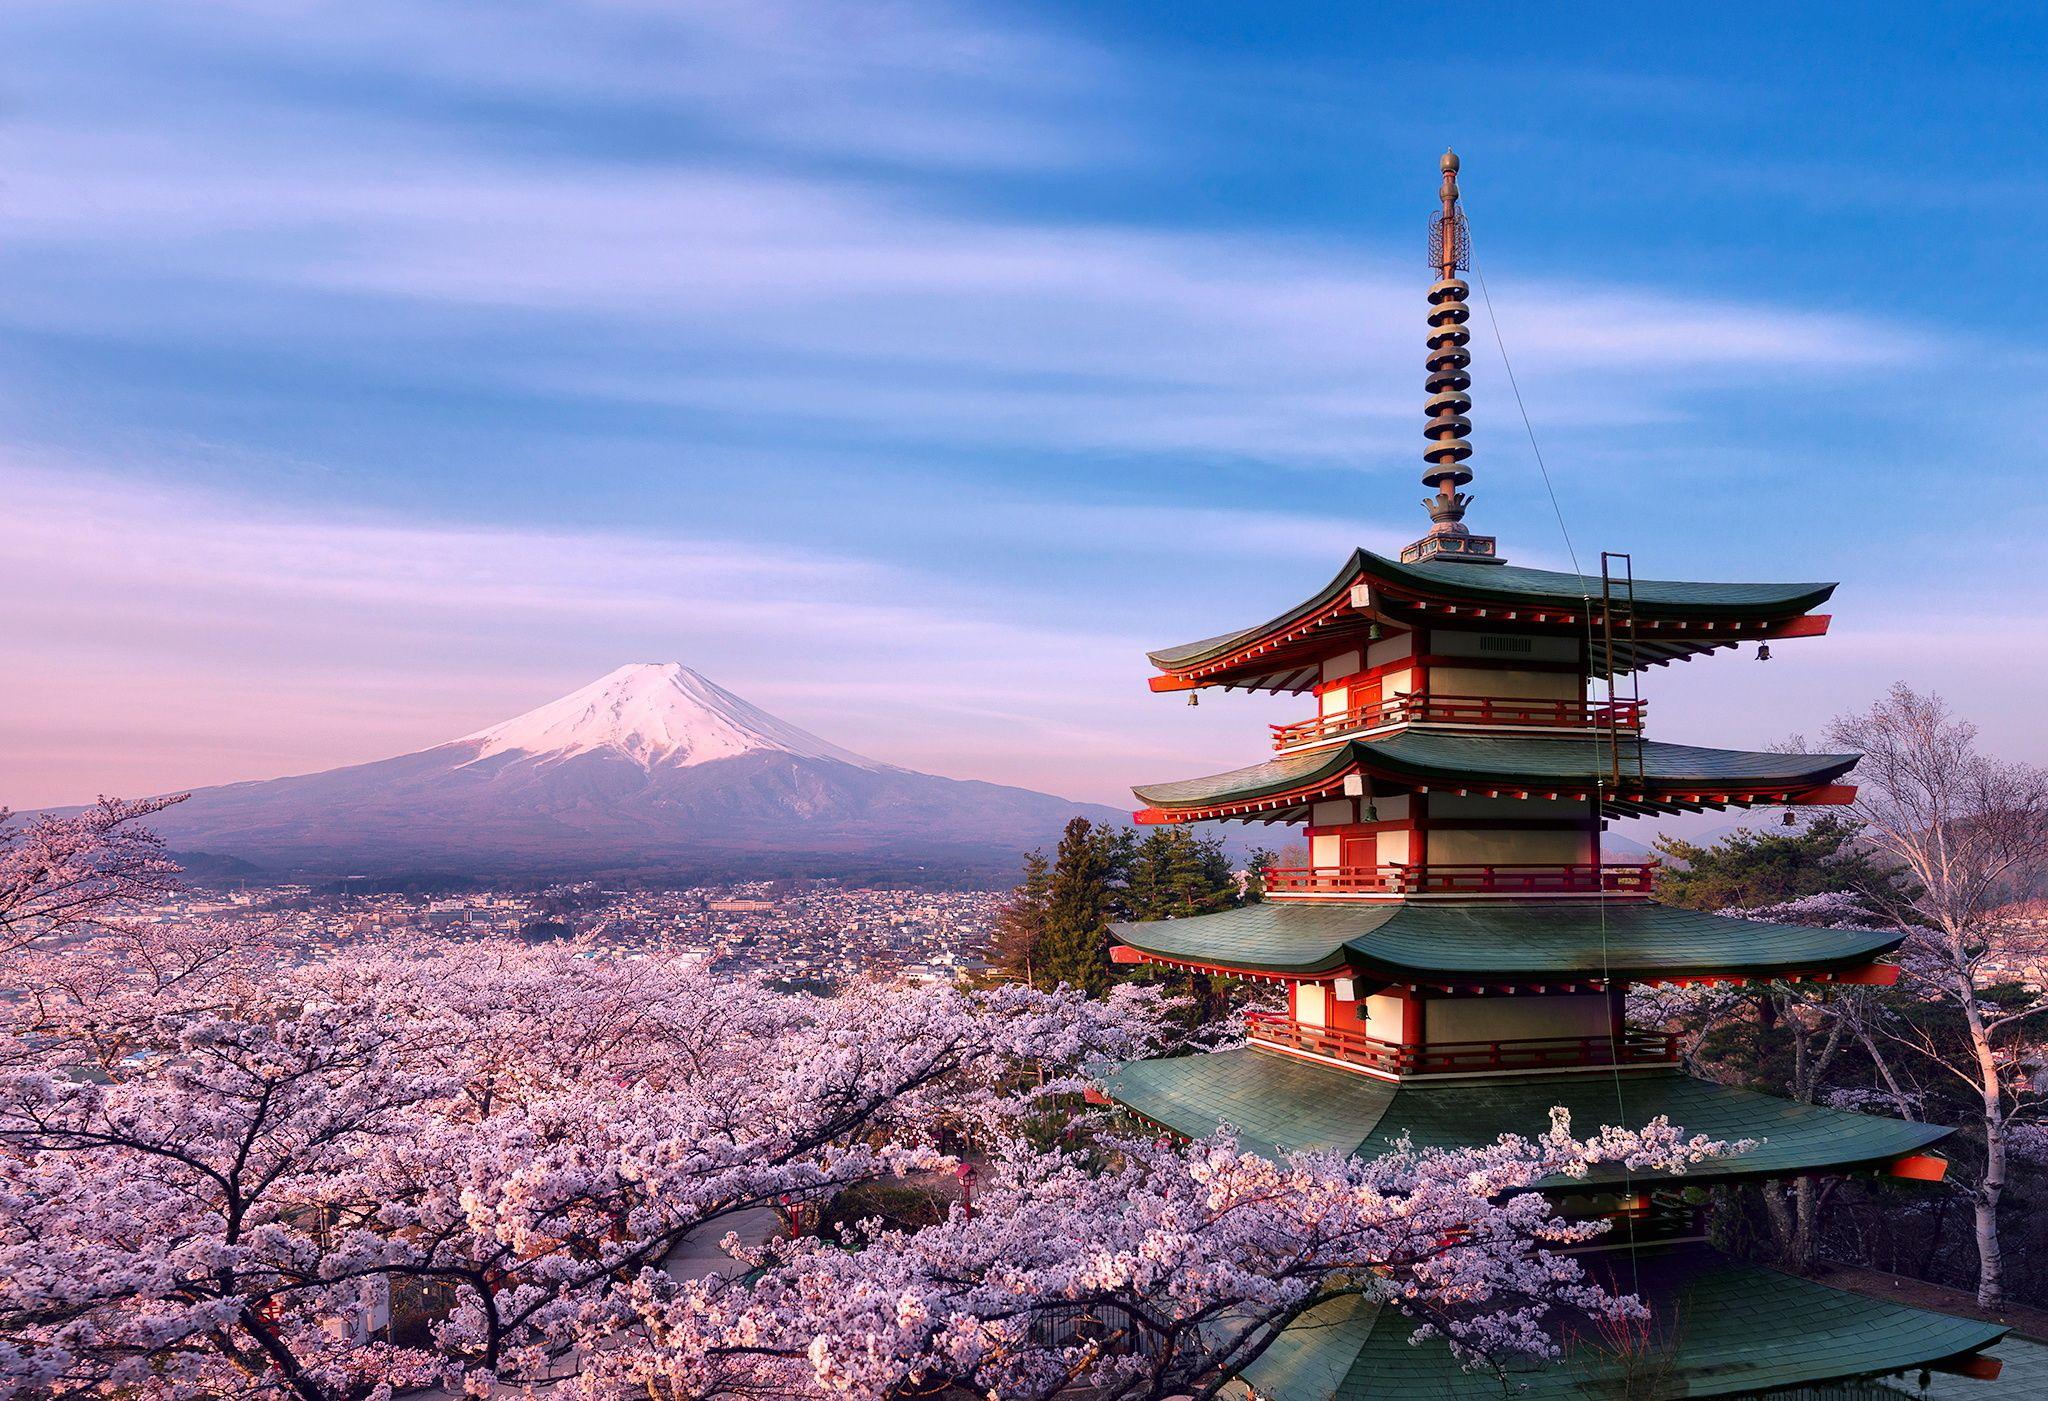 Japan Wallpapers Desktop Wallpaper Goodwp Com Mount Fuji Japan Japan Photo